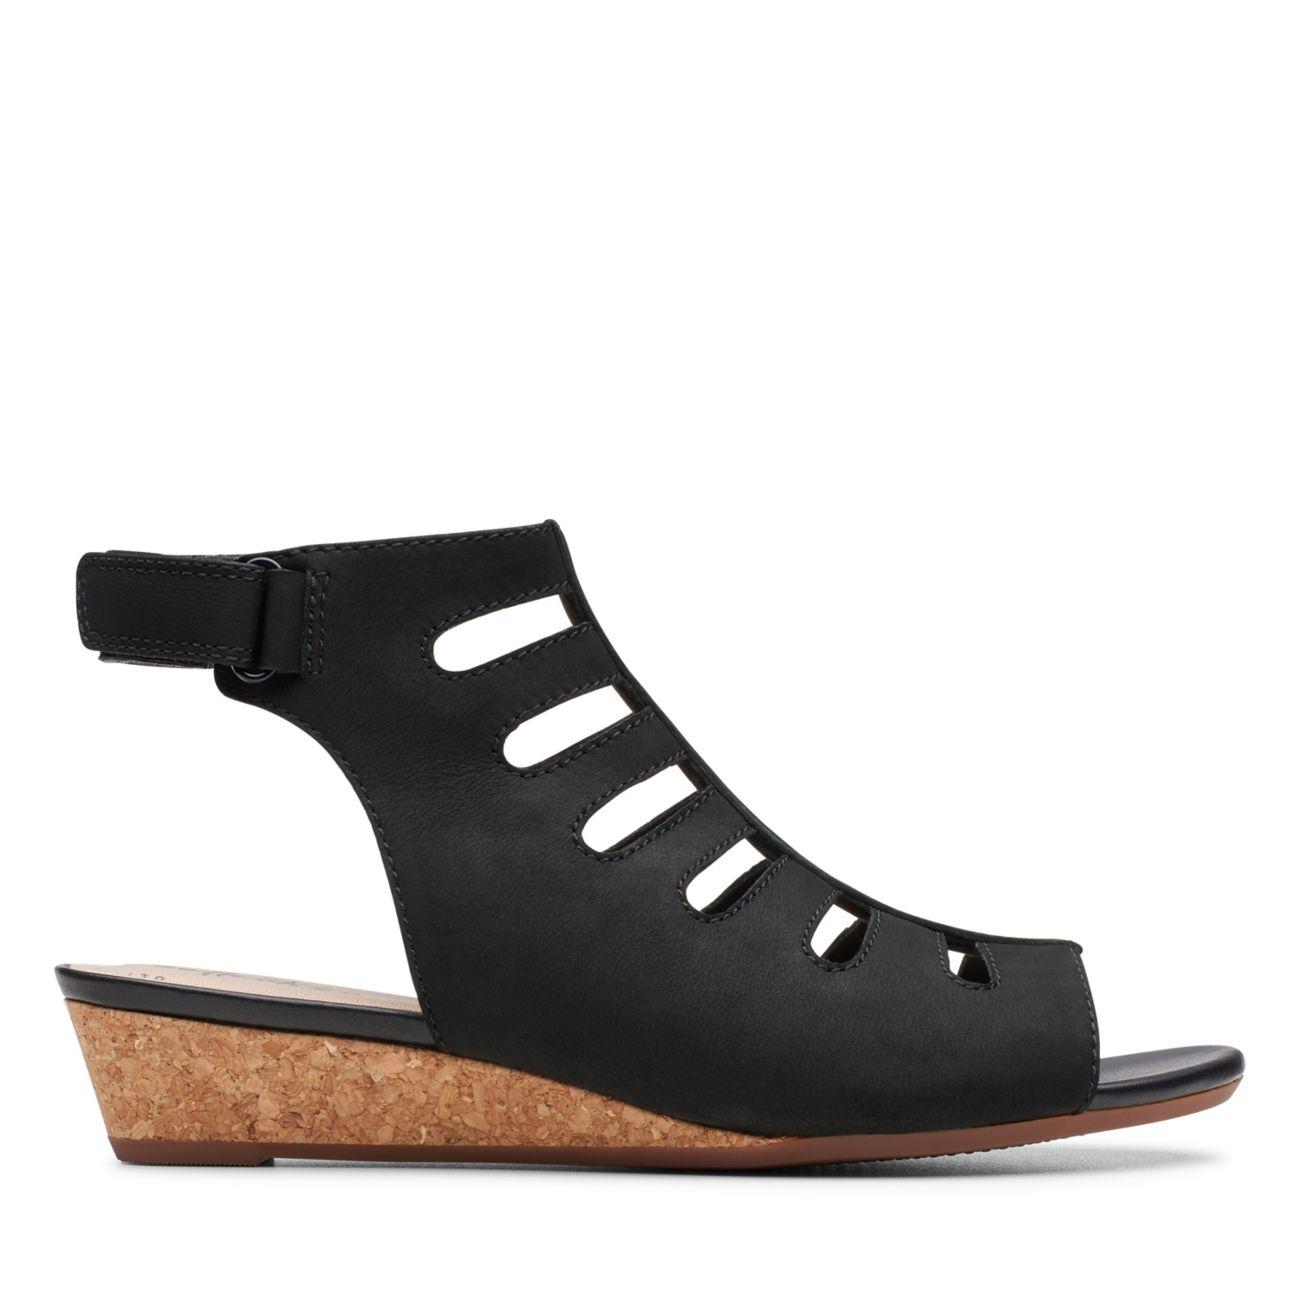 Abigail Sing Black Nubuck - Clarks® Shoes Official Site | Clarks